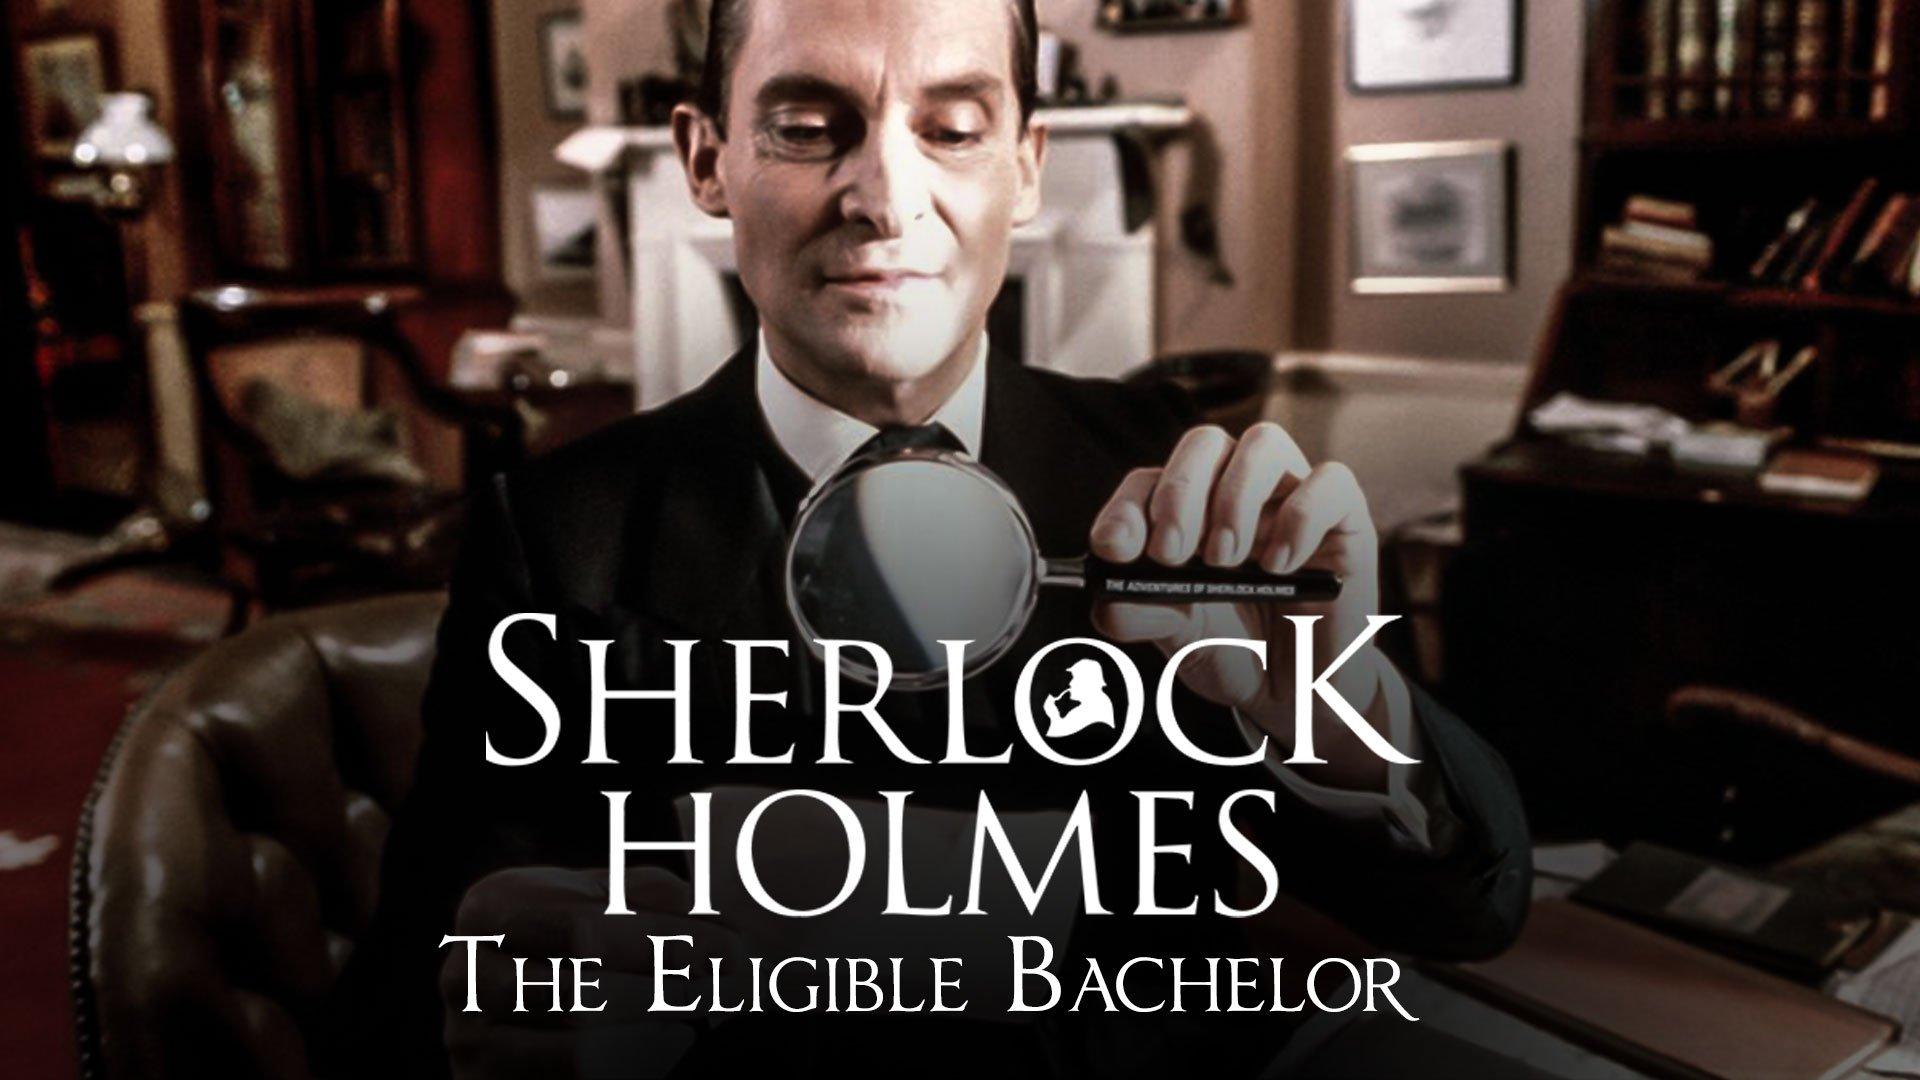 Sherlock Holmes: The Eligible Bachelor on BritBox UK